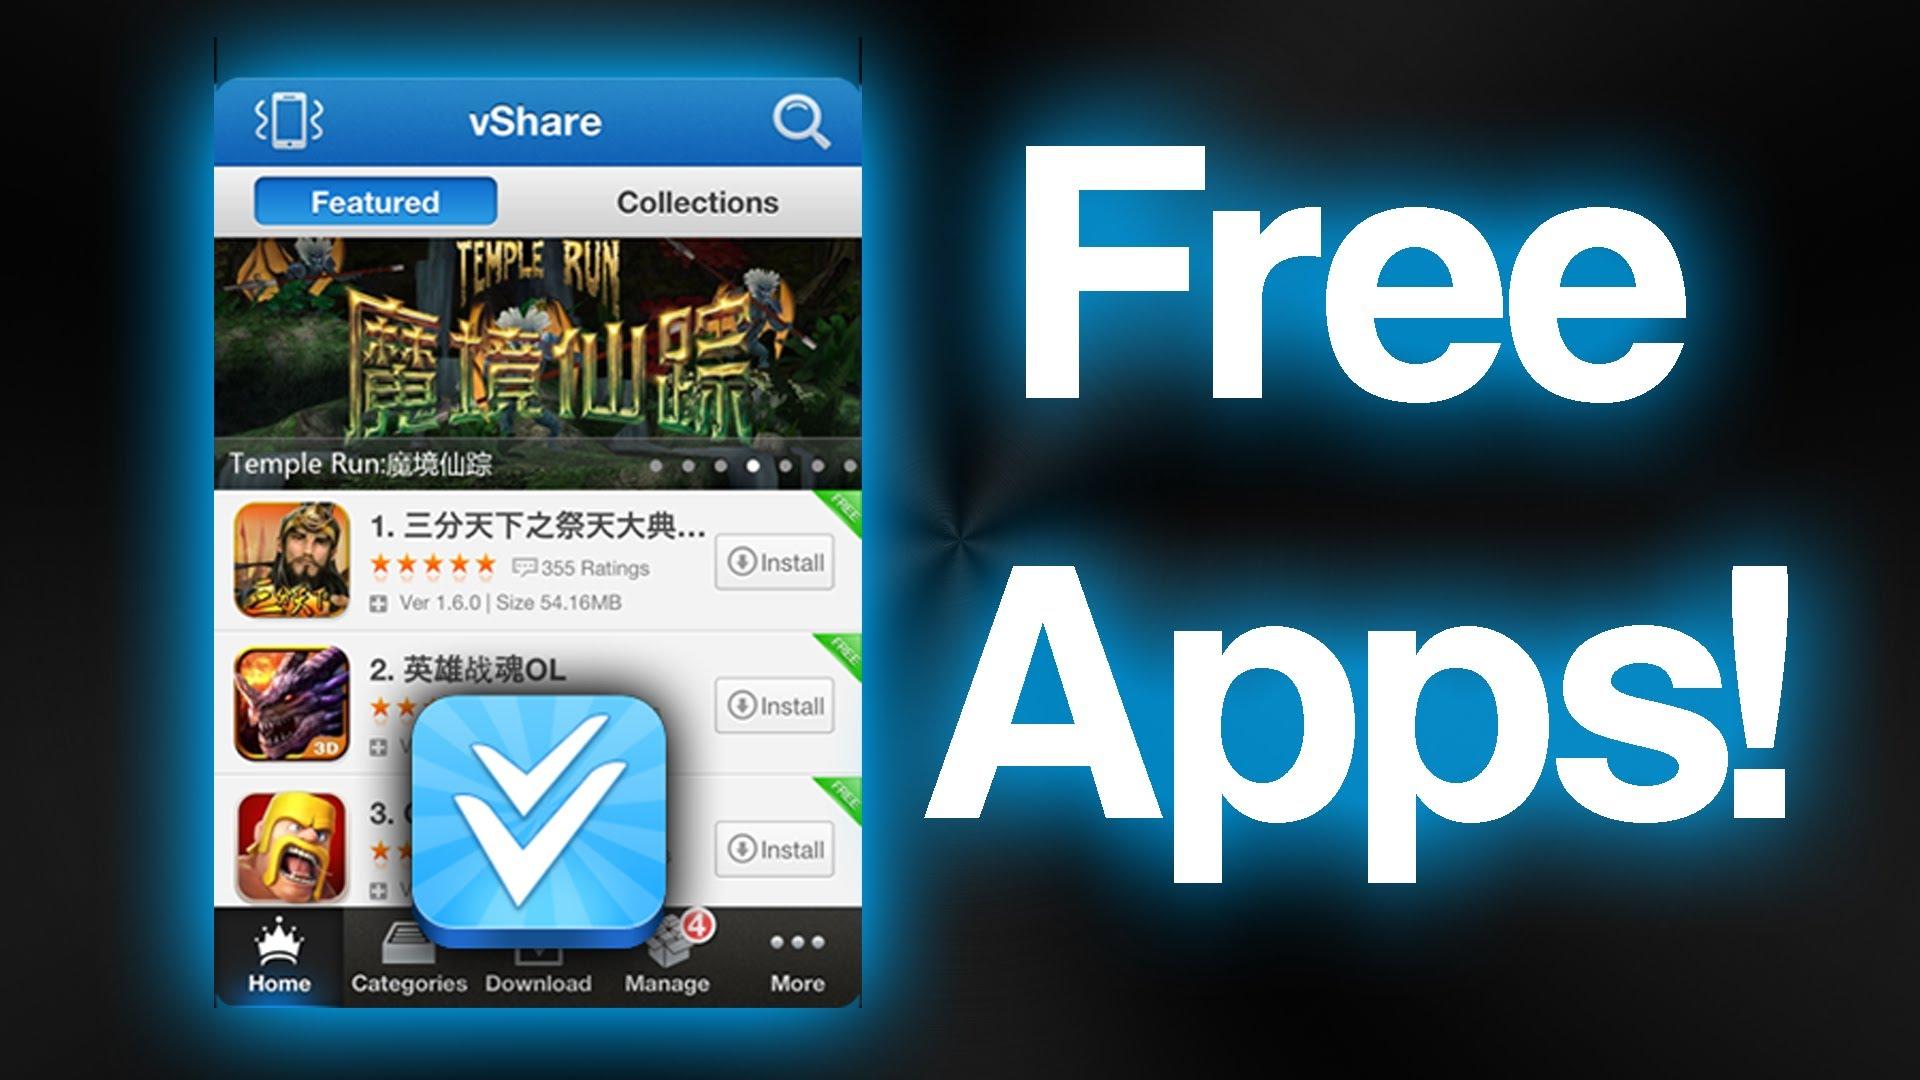 Download vShare iOS 10 without Jailbreak | iPhone/iPad - Working Method